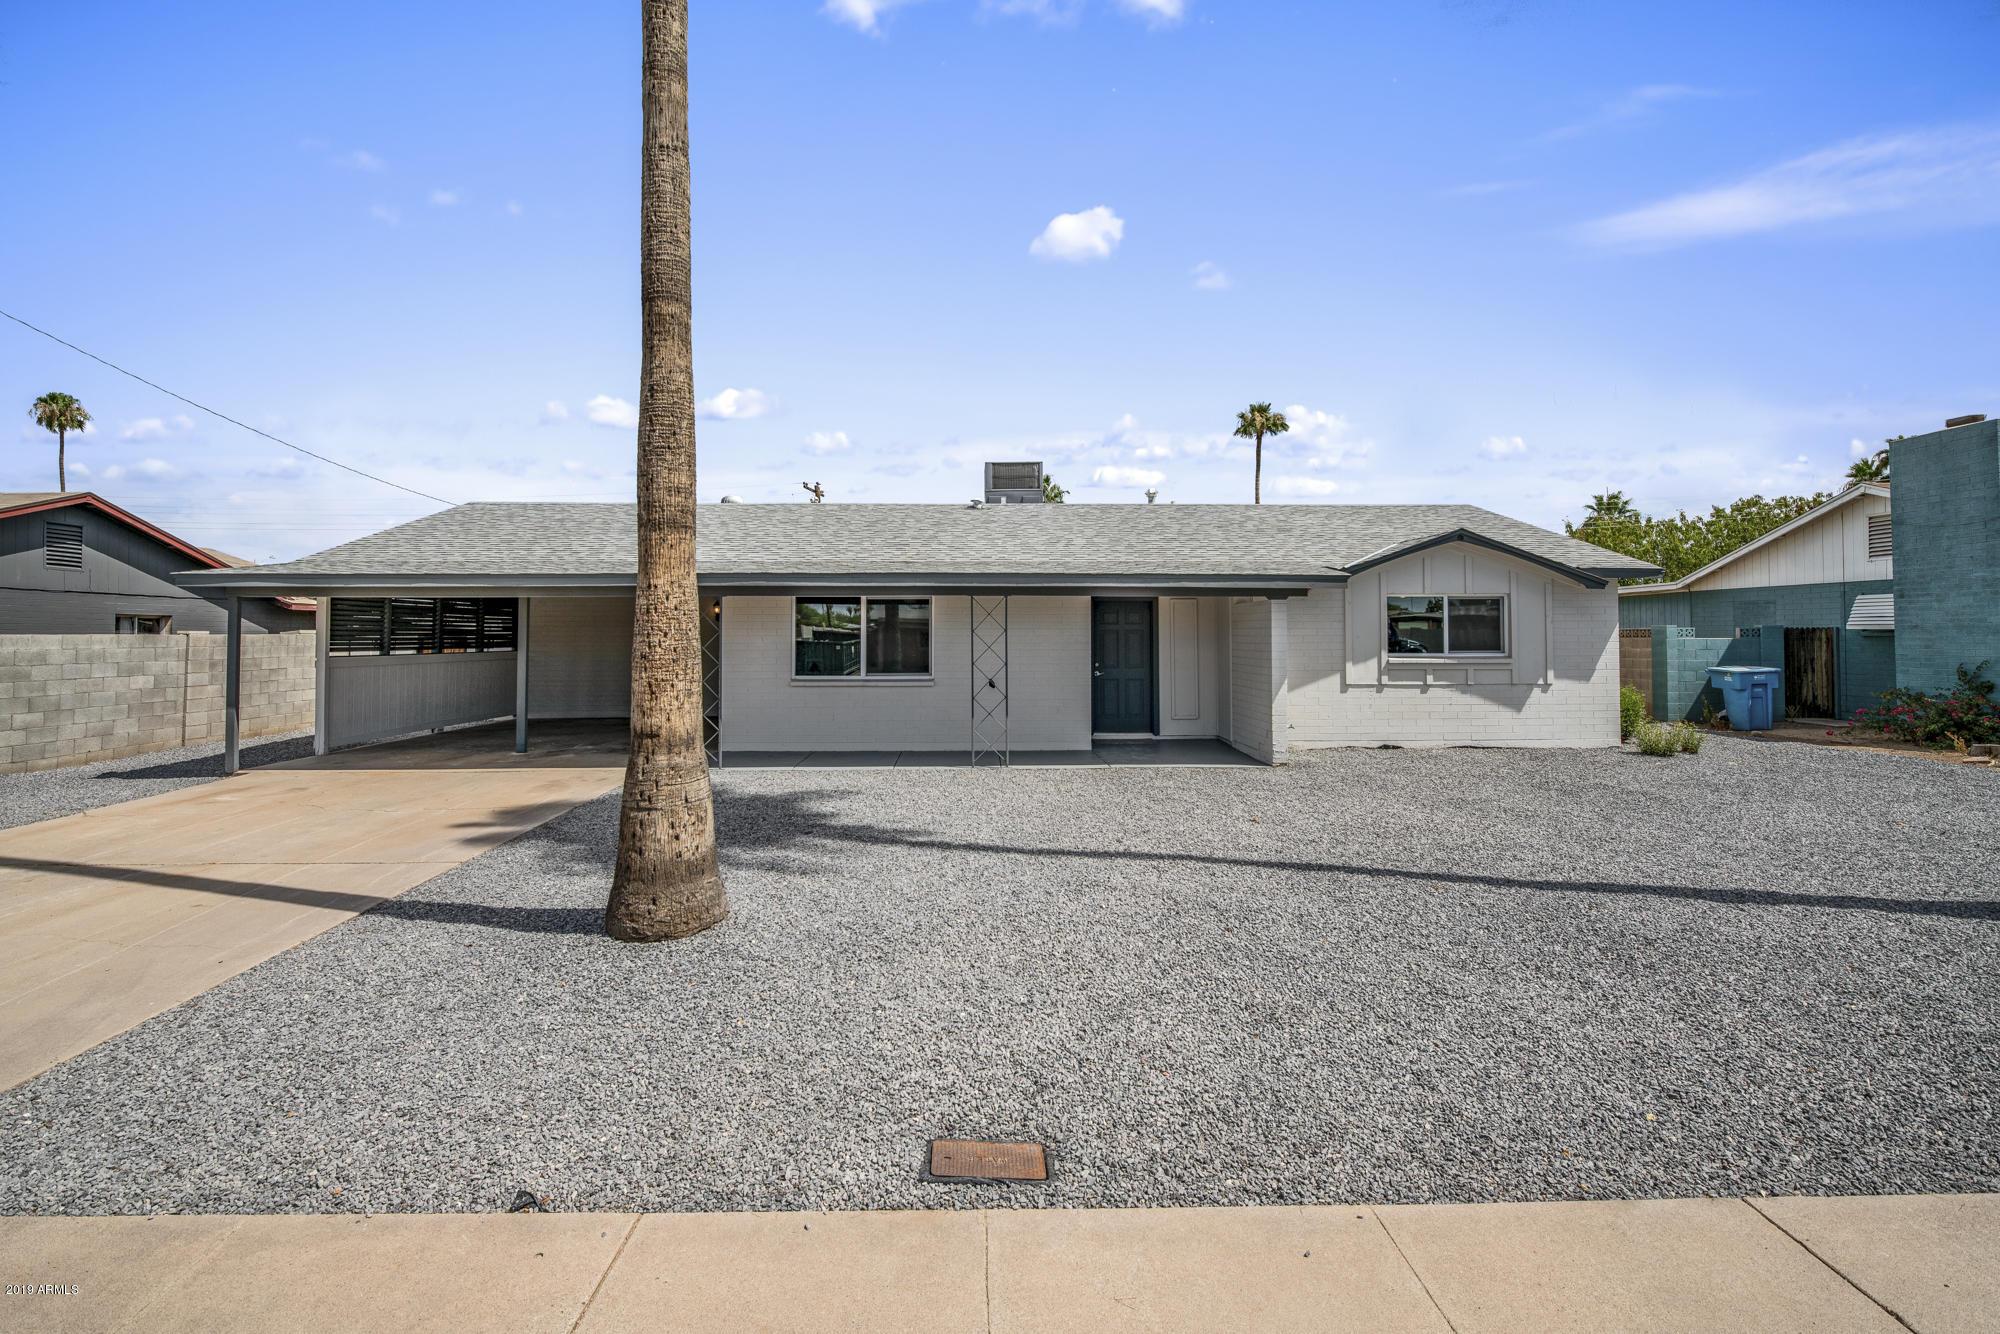 Photo of 6416 W GLENROSA Avenue, Phoenix, AZ 85033